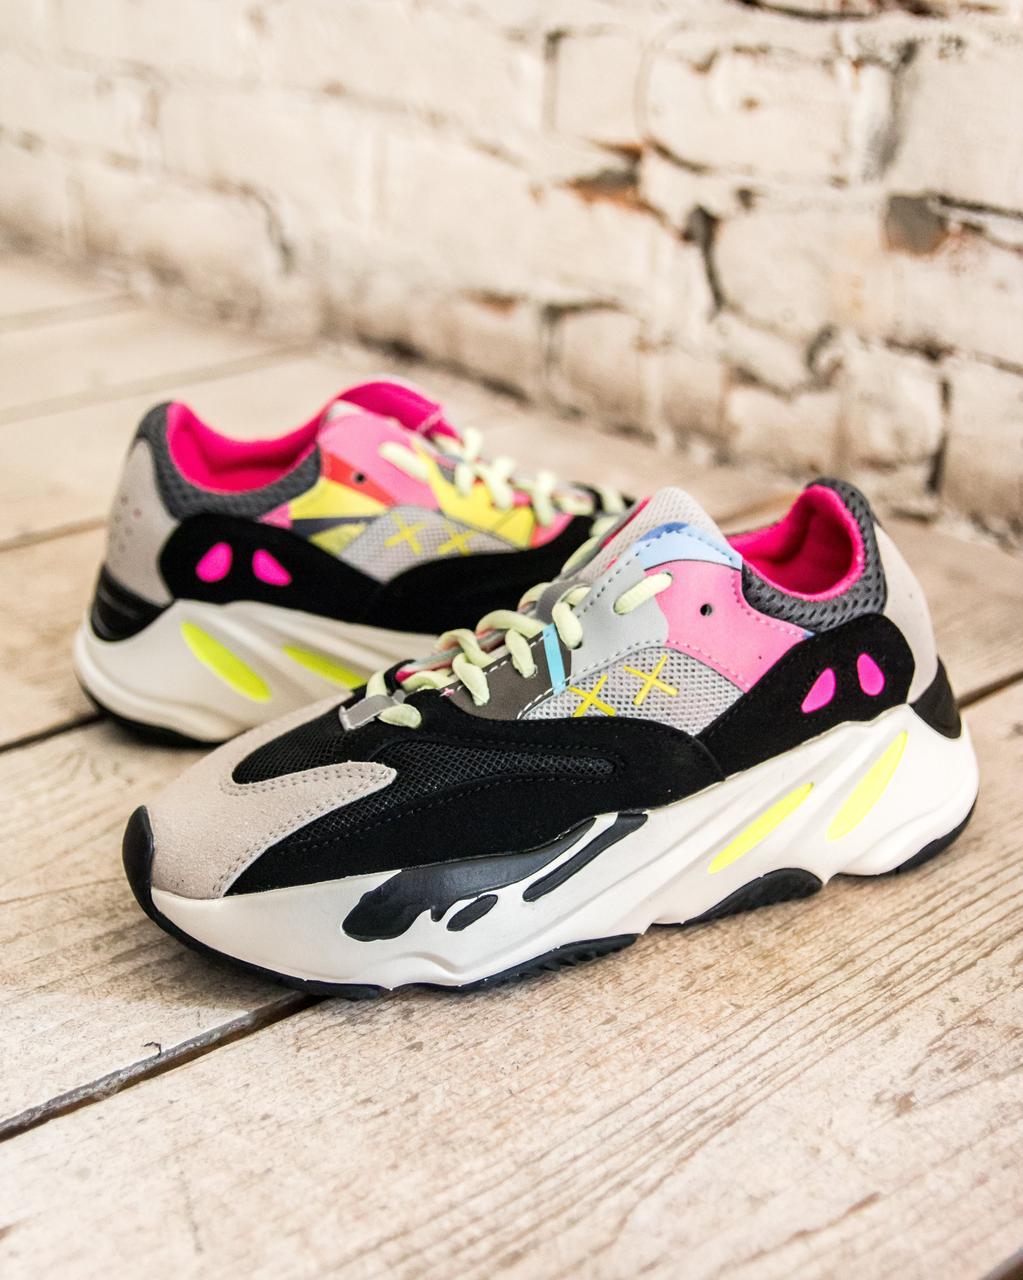 "ea7cacd4 Кроссовки Adidas Yeezy Boost 700 ""Wave Runners"" (адидас иззи буст цветные) -"